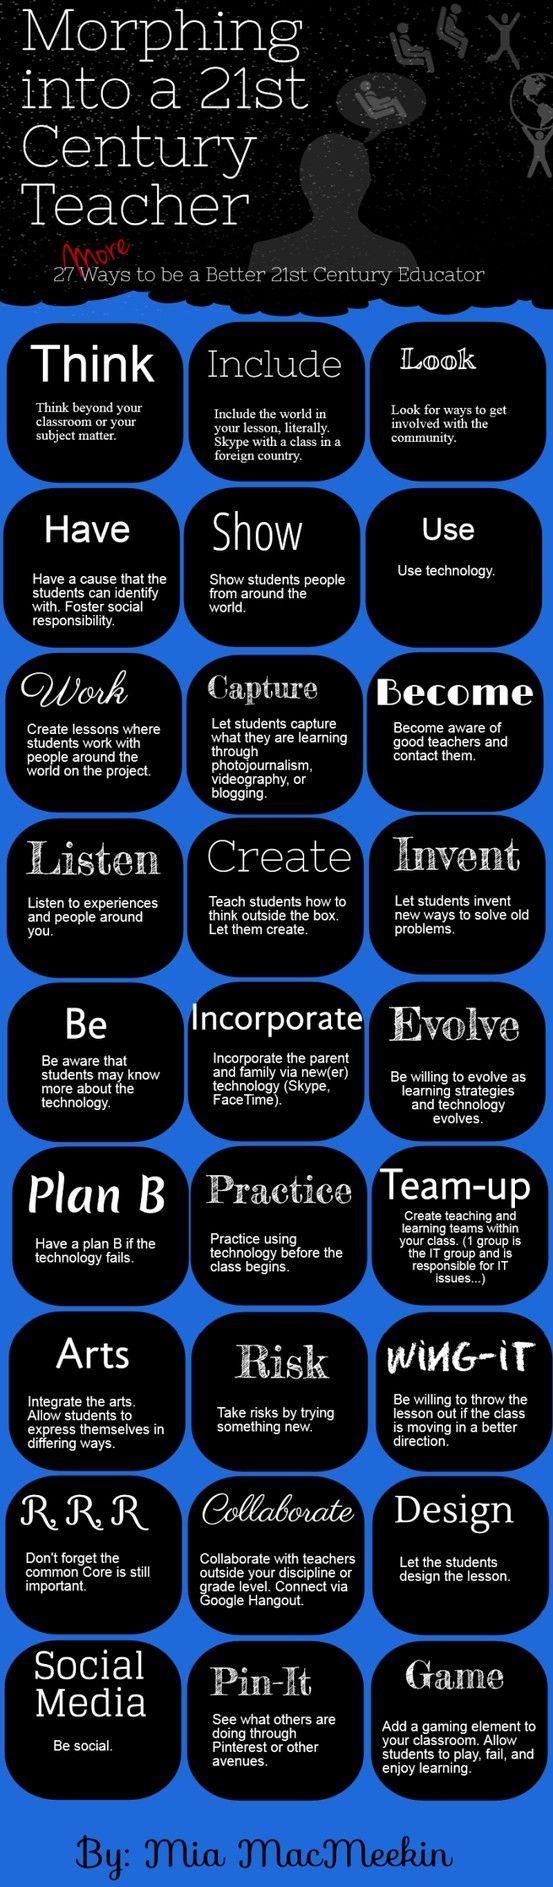 Infographic - Morphing into a 21st Century Teacher Courtesy of Mia MacMeekin